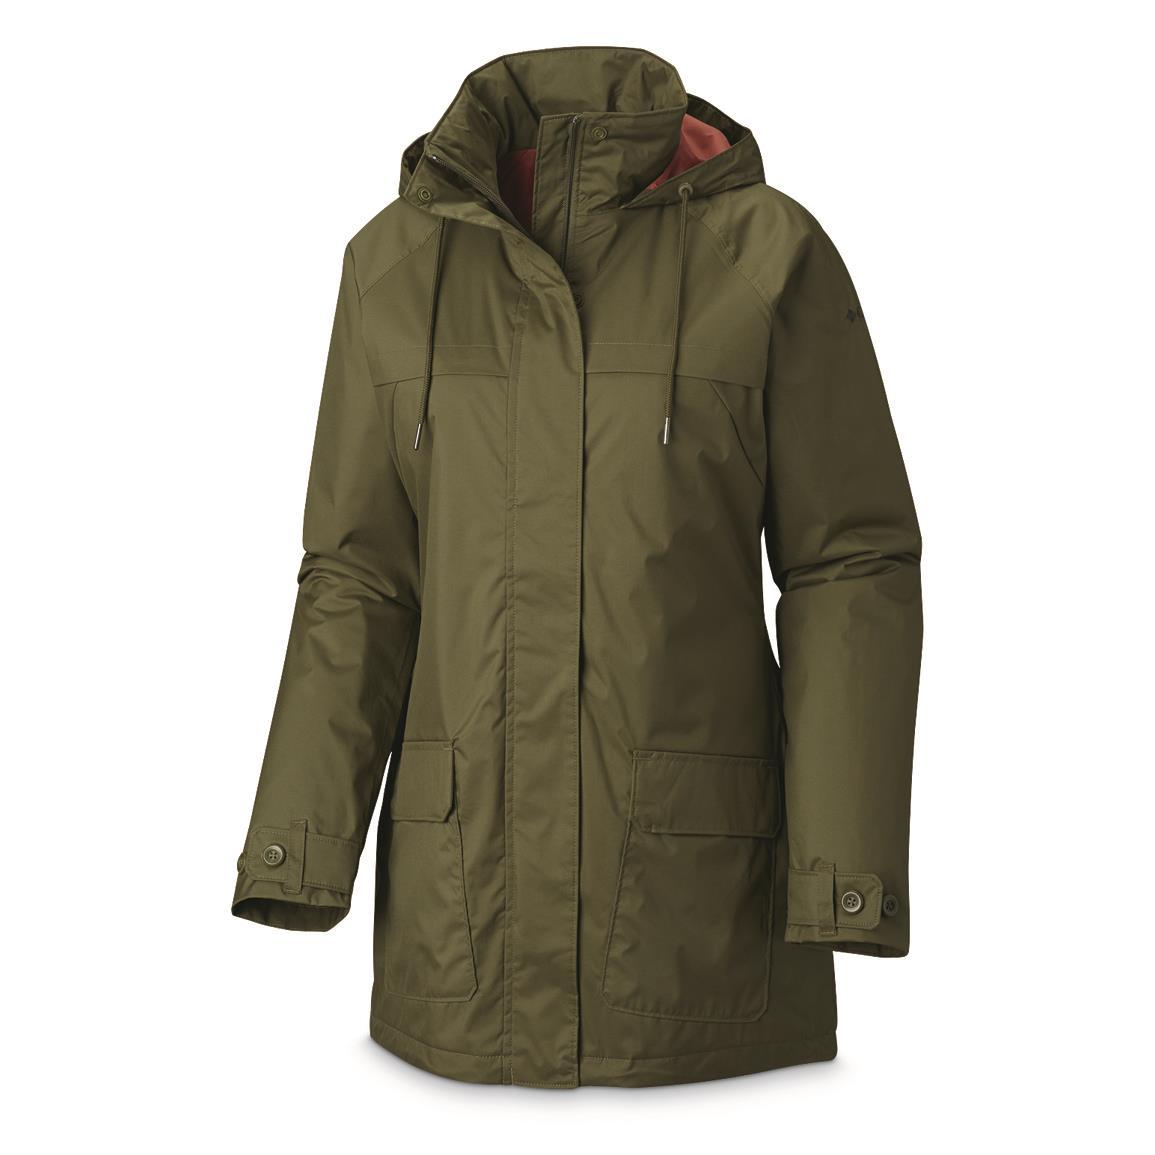 waterproof coats columbia womenu0027s lookout crest insulated waterproof jacket, nori green EKEOGOW